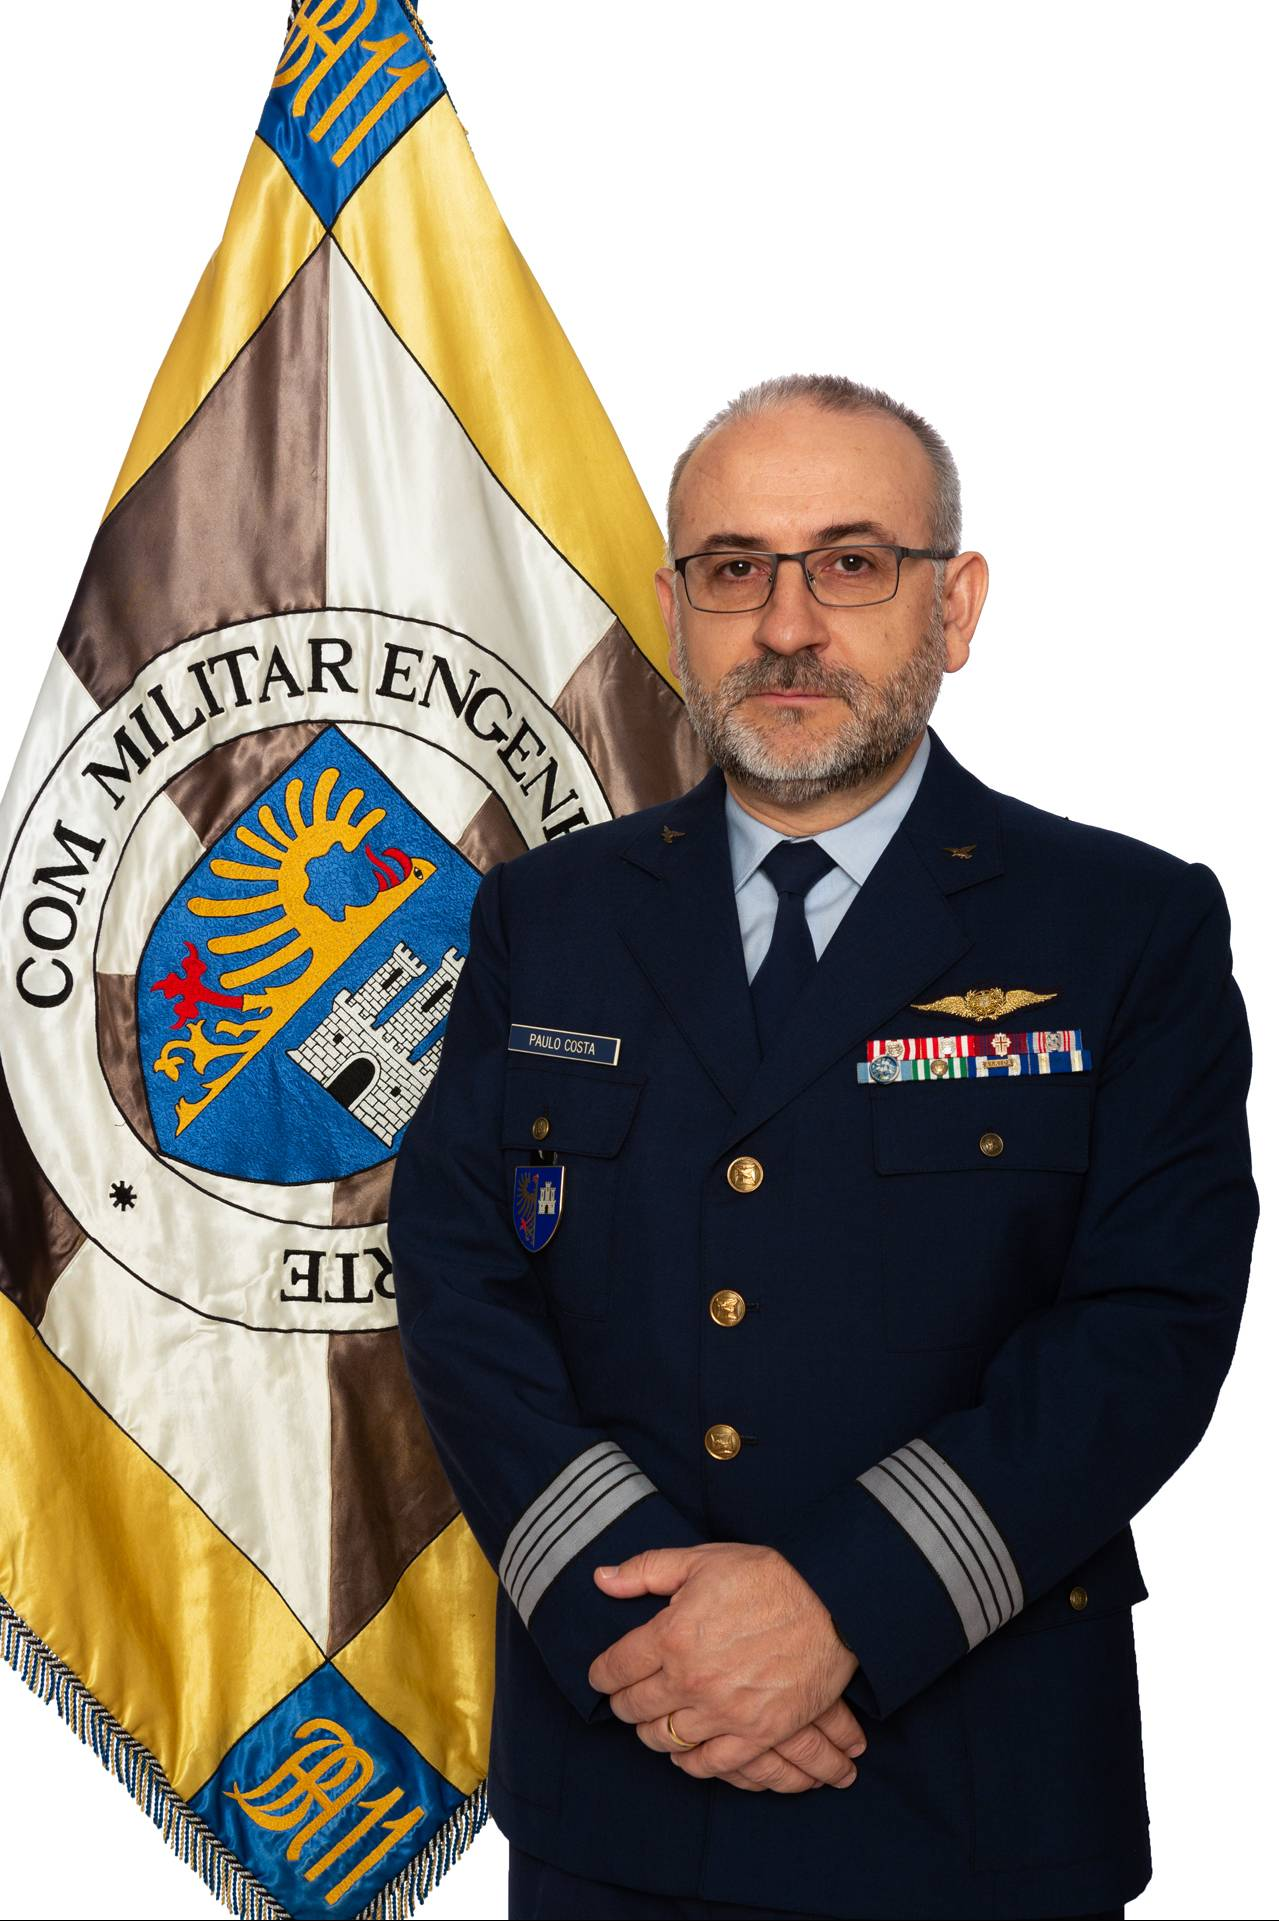 Foto de Coronel Paulo Américo Oliveira da Costa